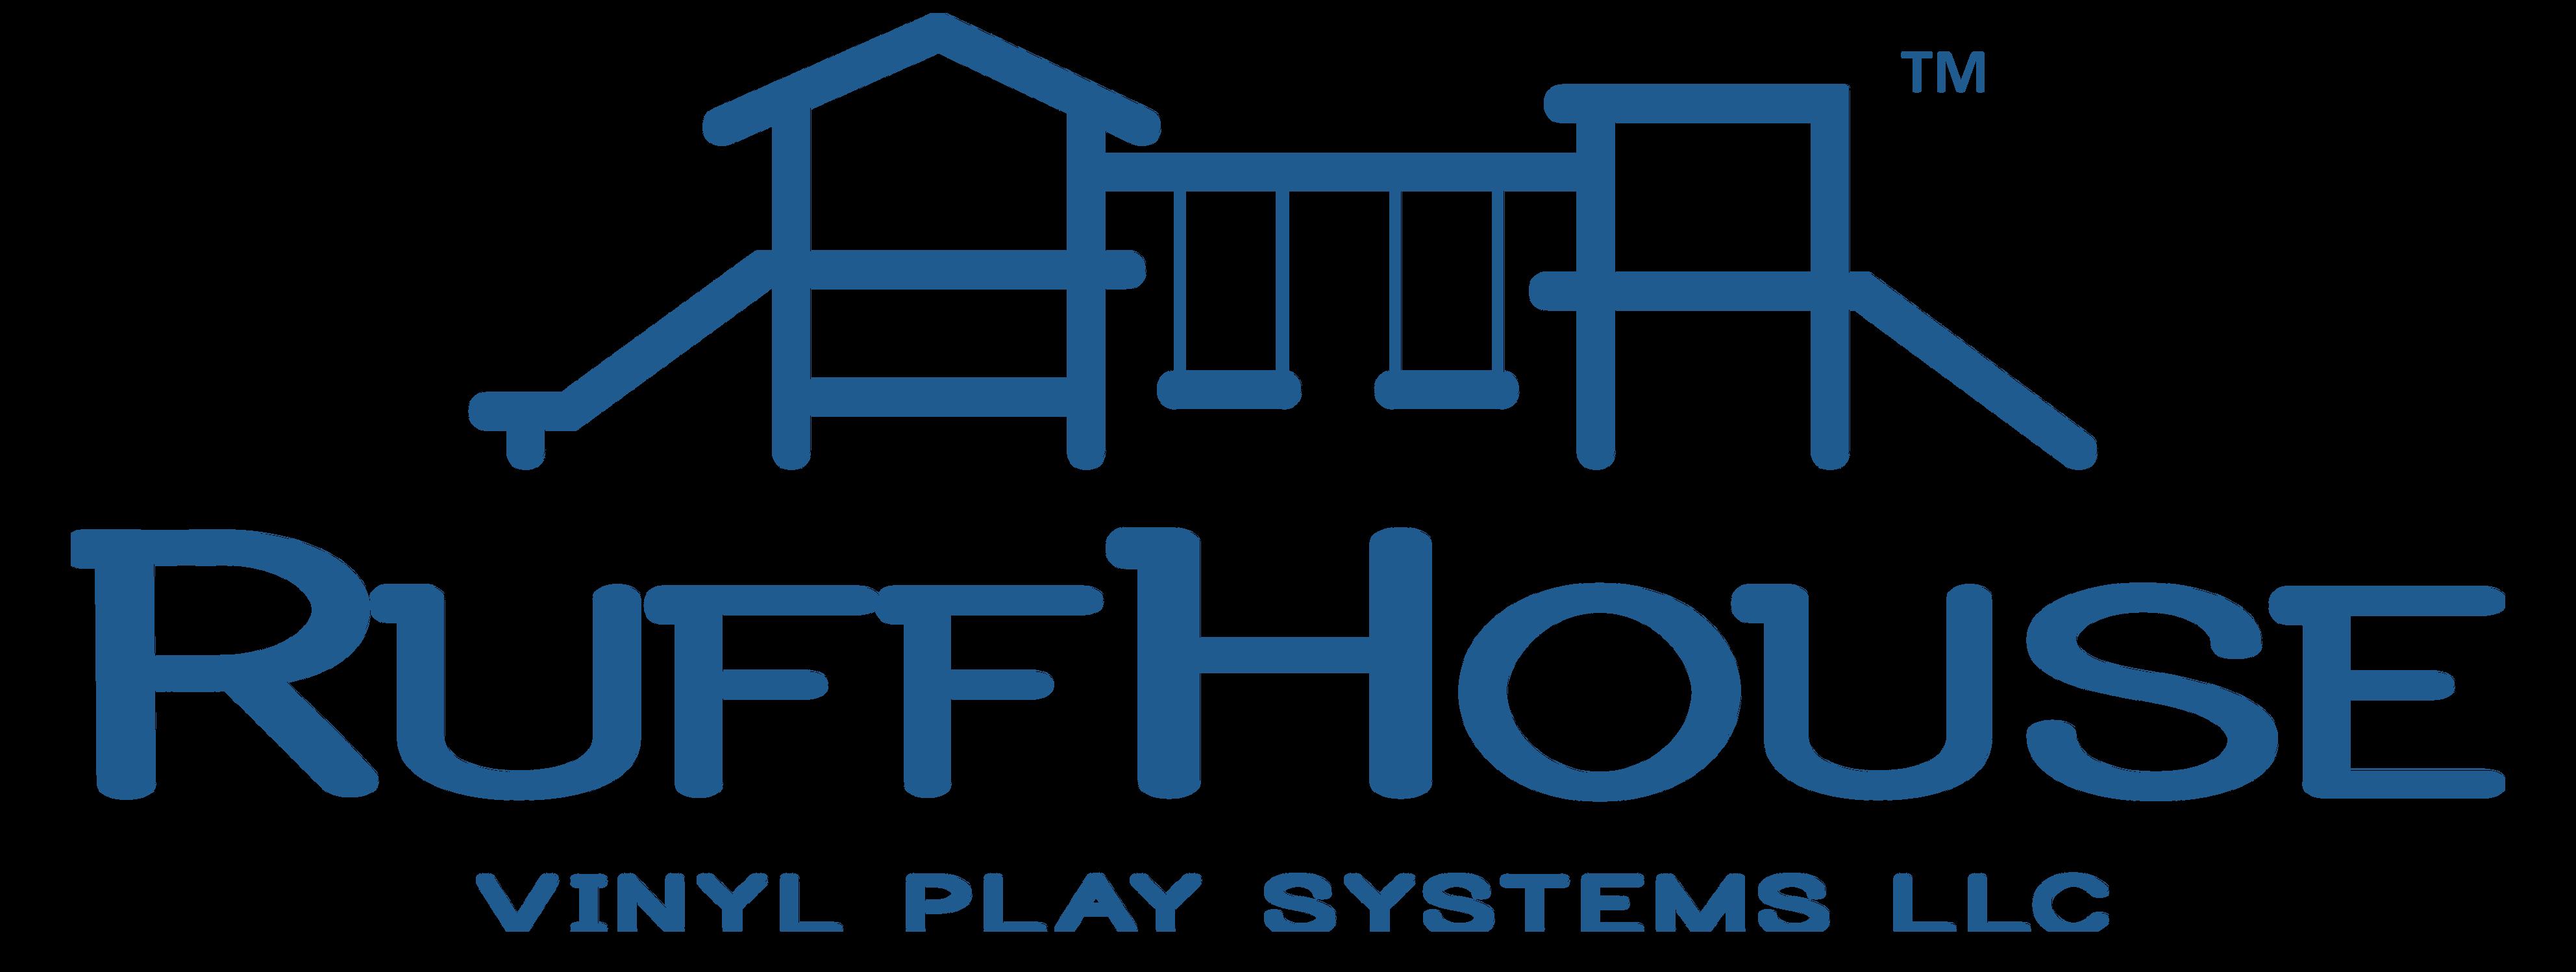 Ruffhouse Vinyl Play Systems